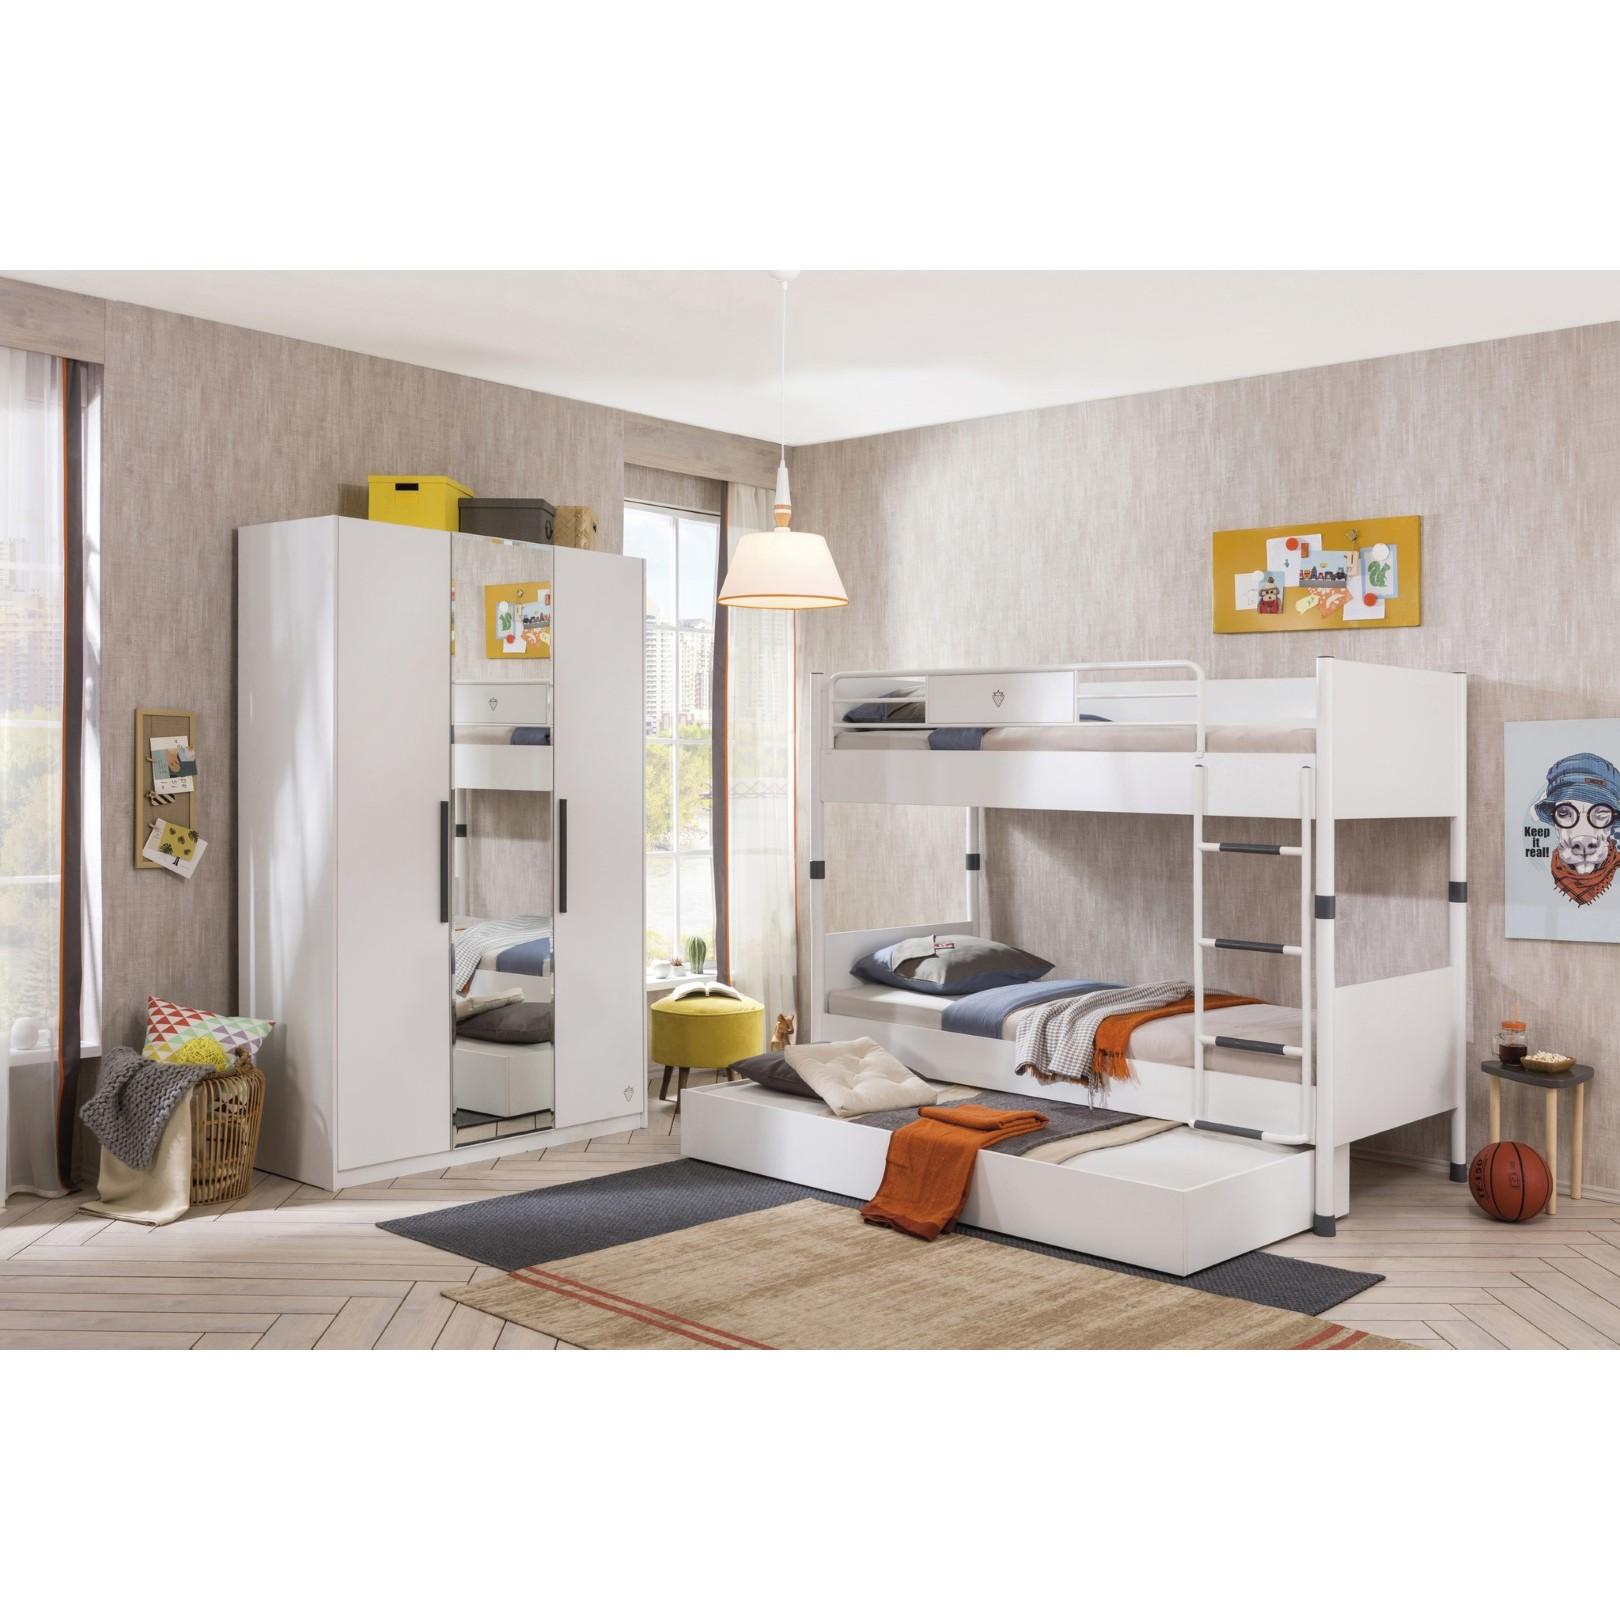 California tienerkamer 3 deurs kledingkast wit Kinderkamer ...